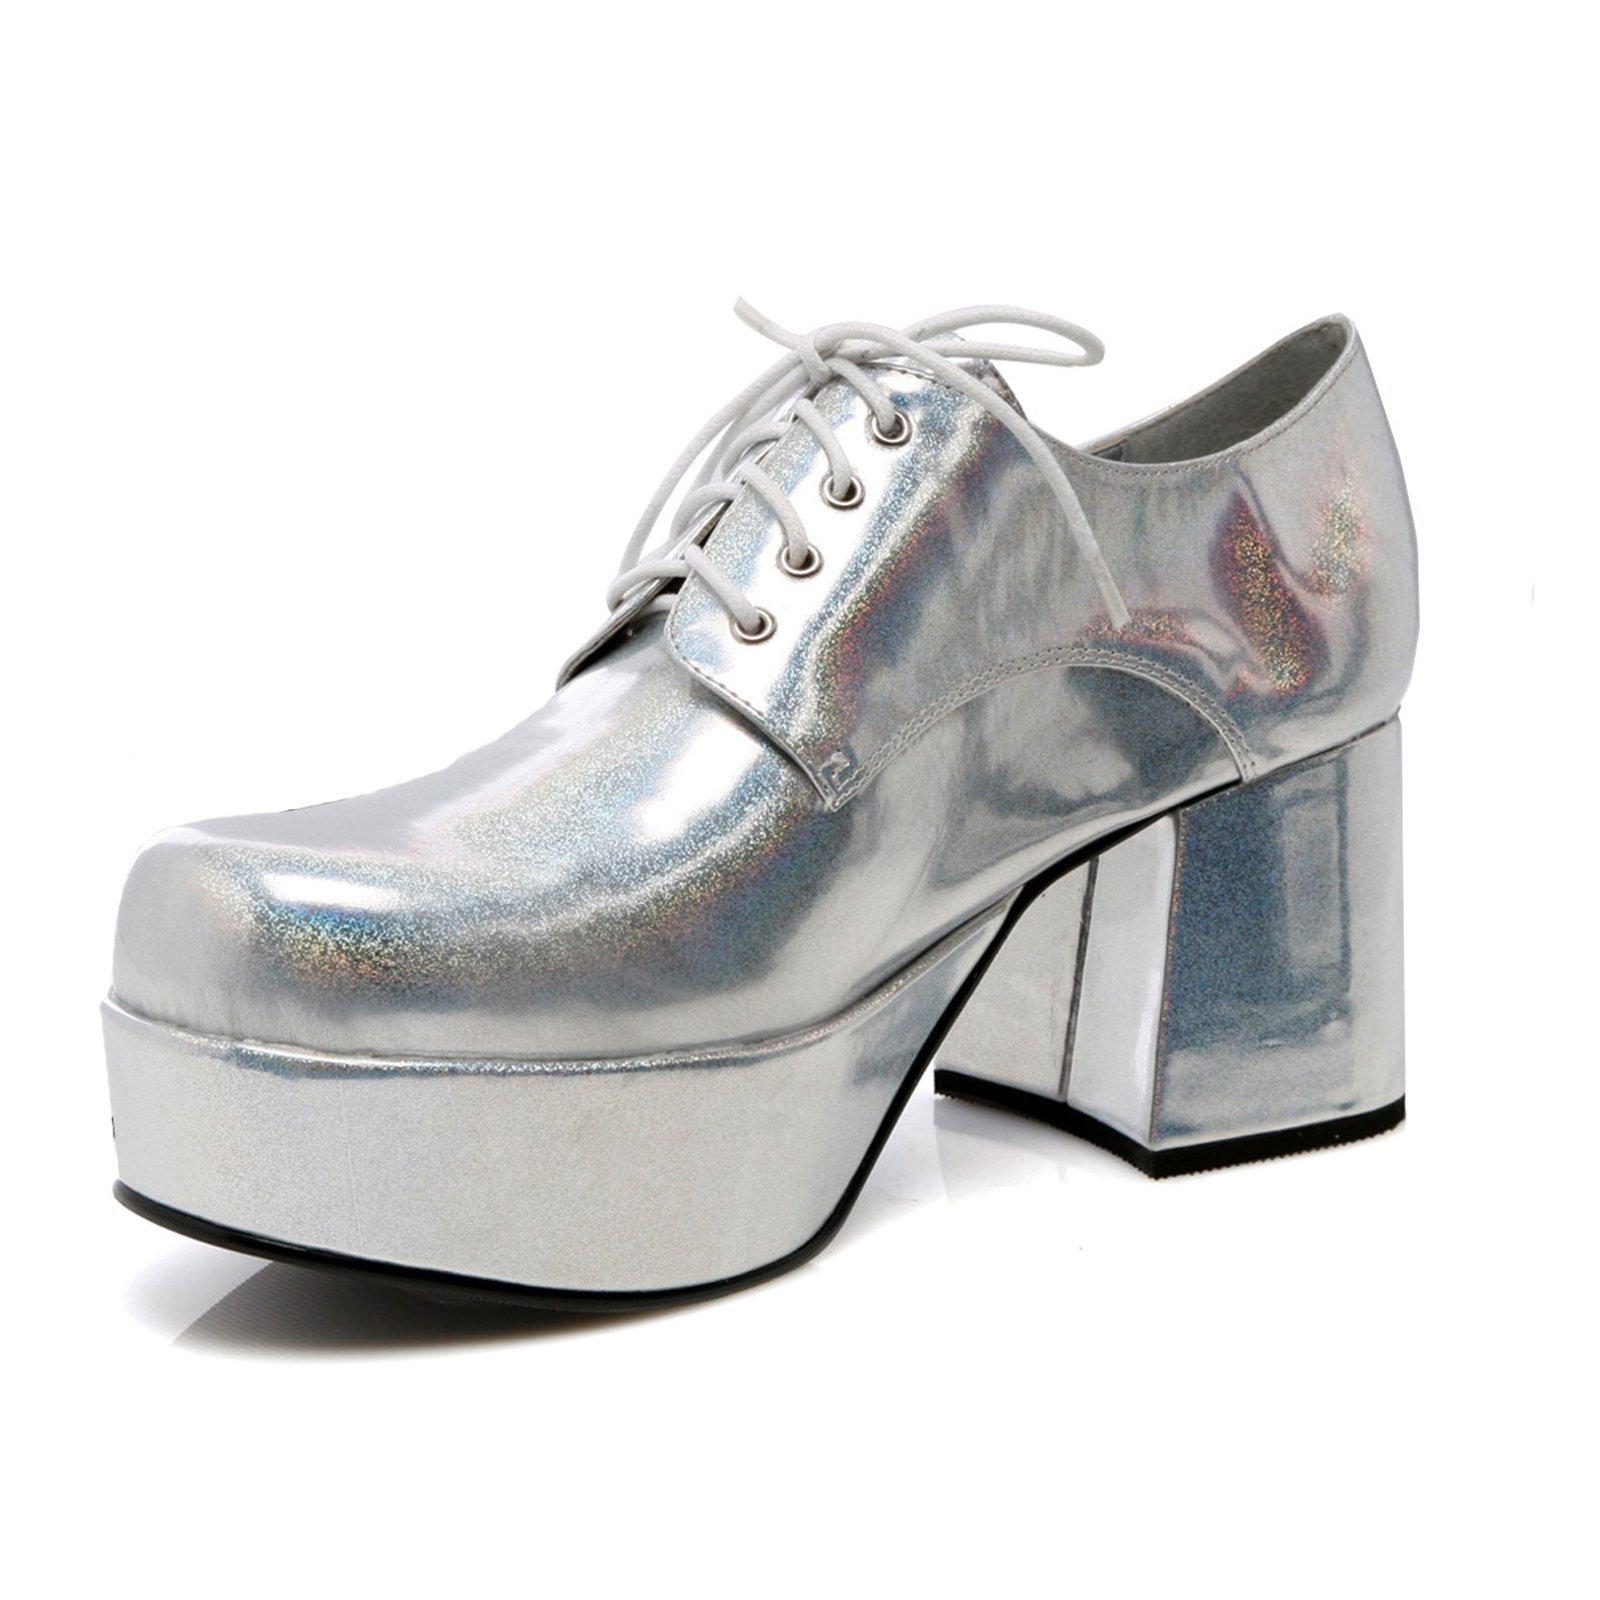 Mens Silver Platform 3'' Heel Halloween Shoes Small 8-9